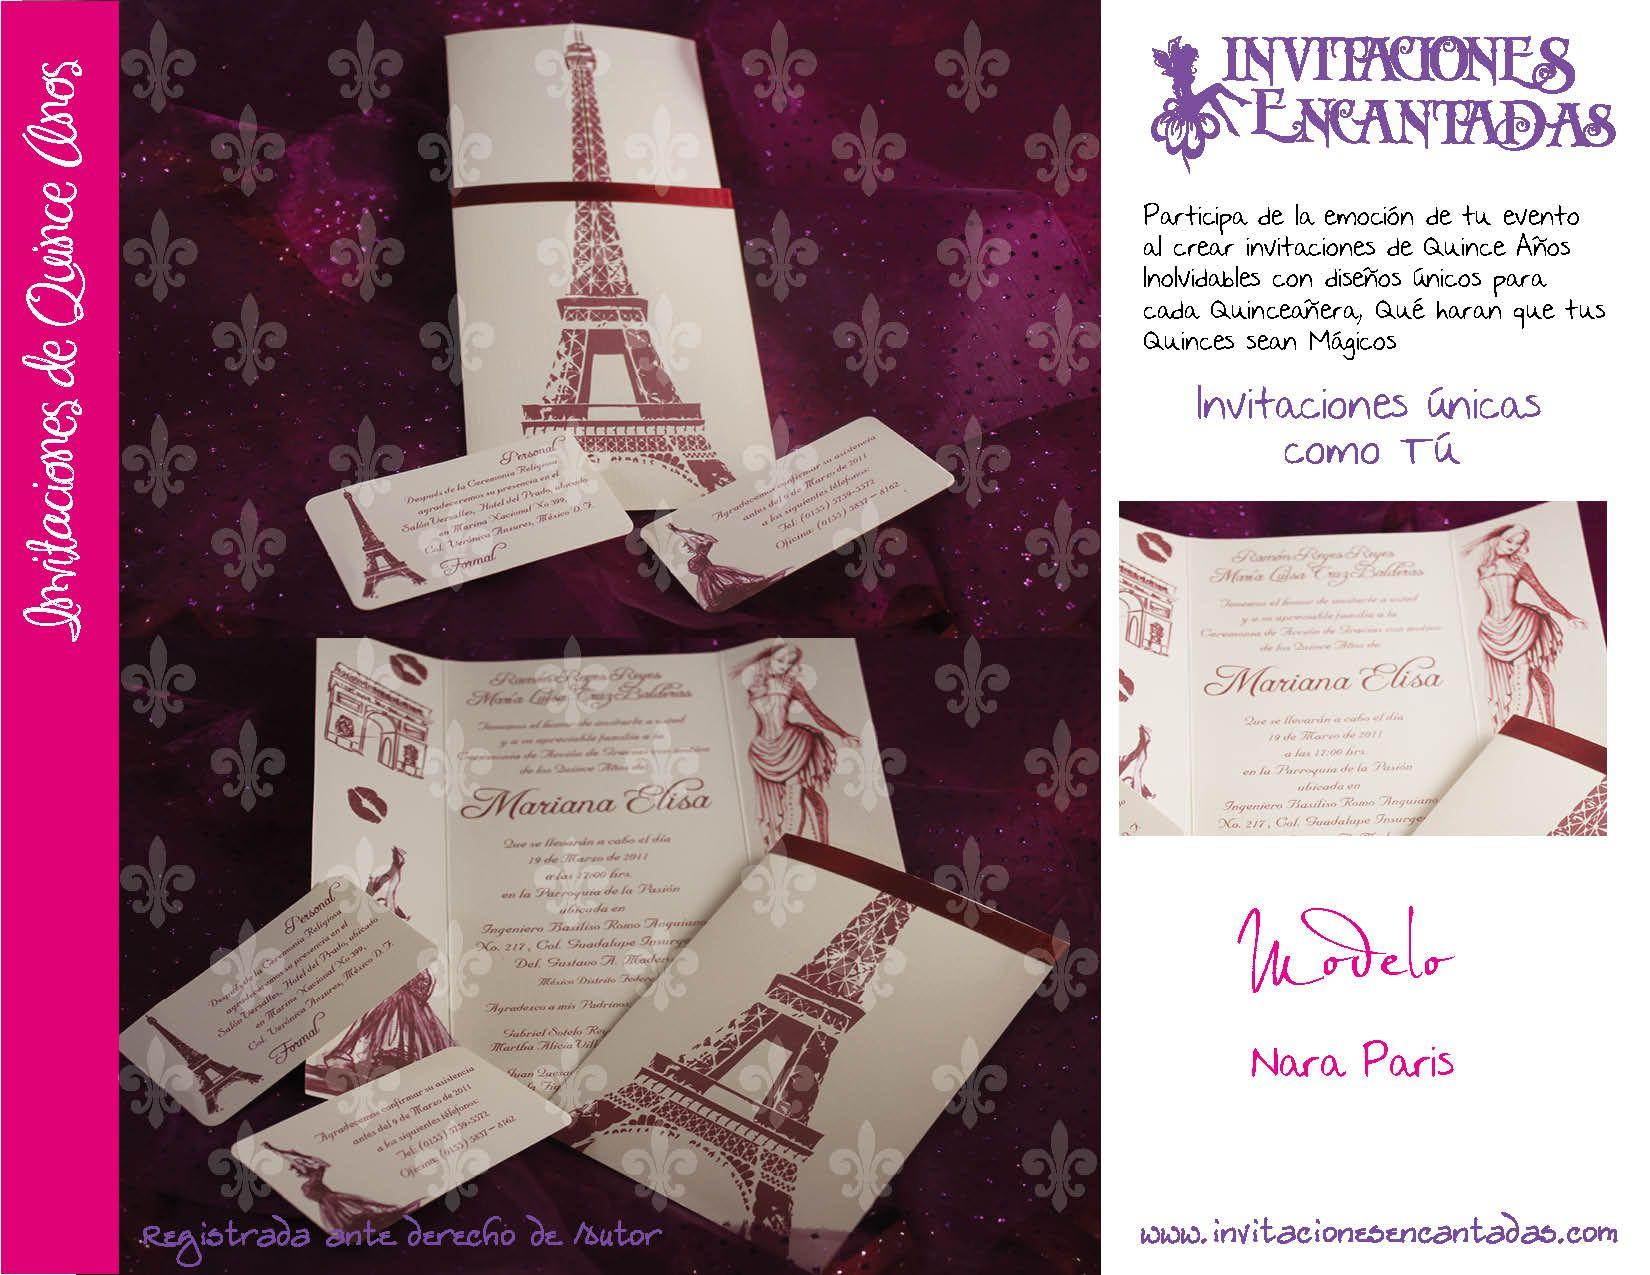 Invitations Bridal Shower with adorable invitations design